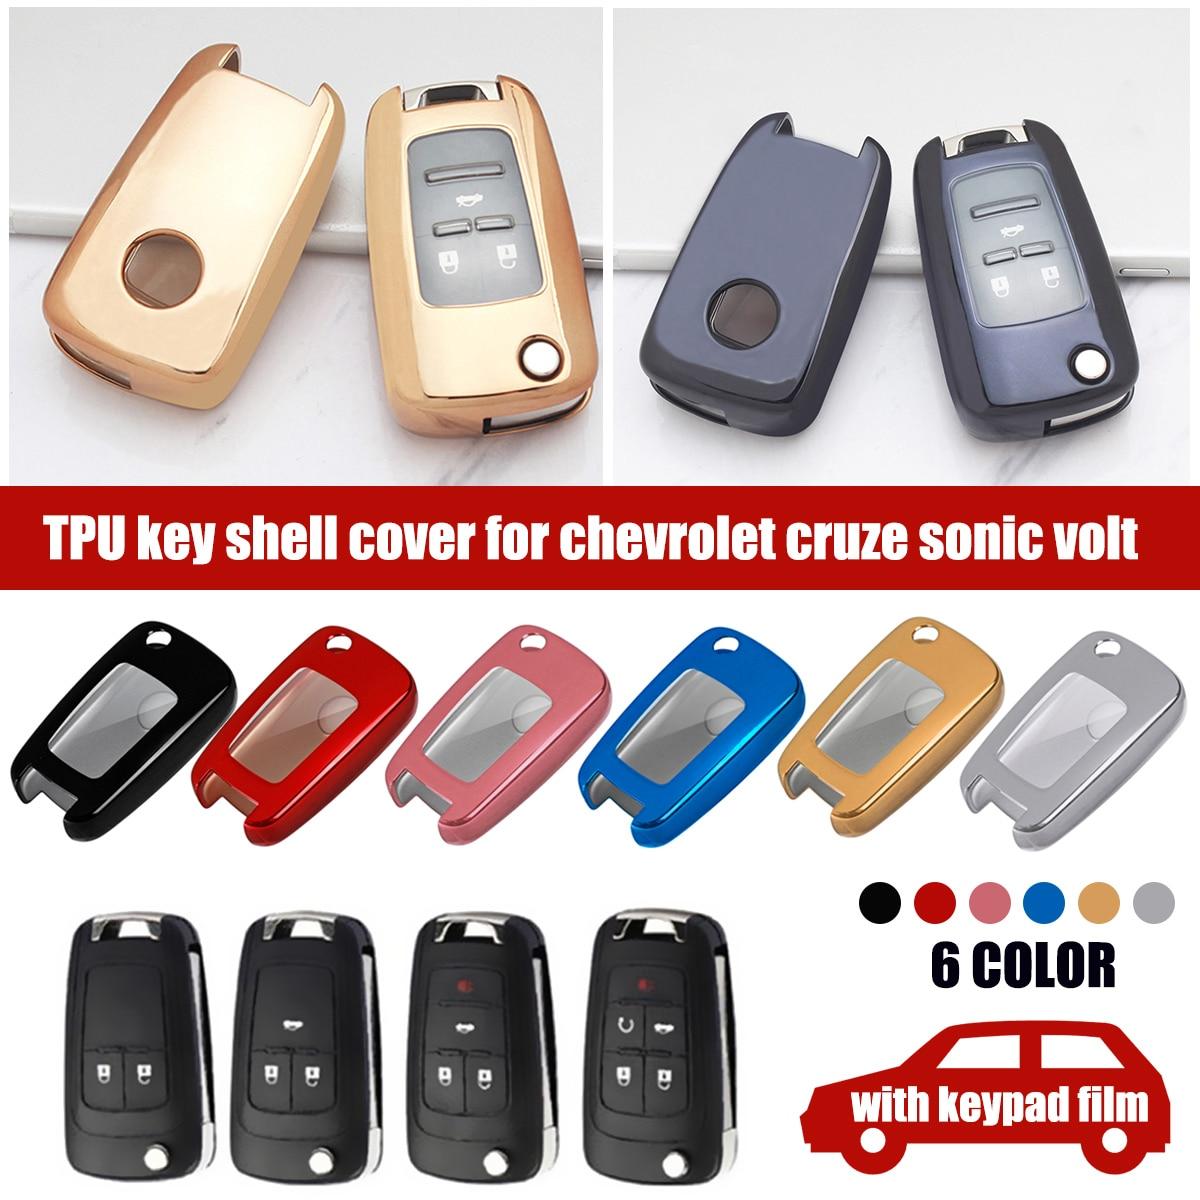 Met Cover TPU Key Holder Cover Case voor Chevrolet voor Cruze Aveo Trax Opel Astra Corsa Meriva Zafira Antara J mokka Insignia